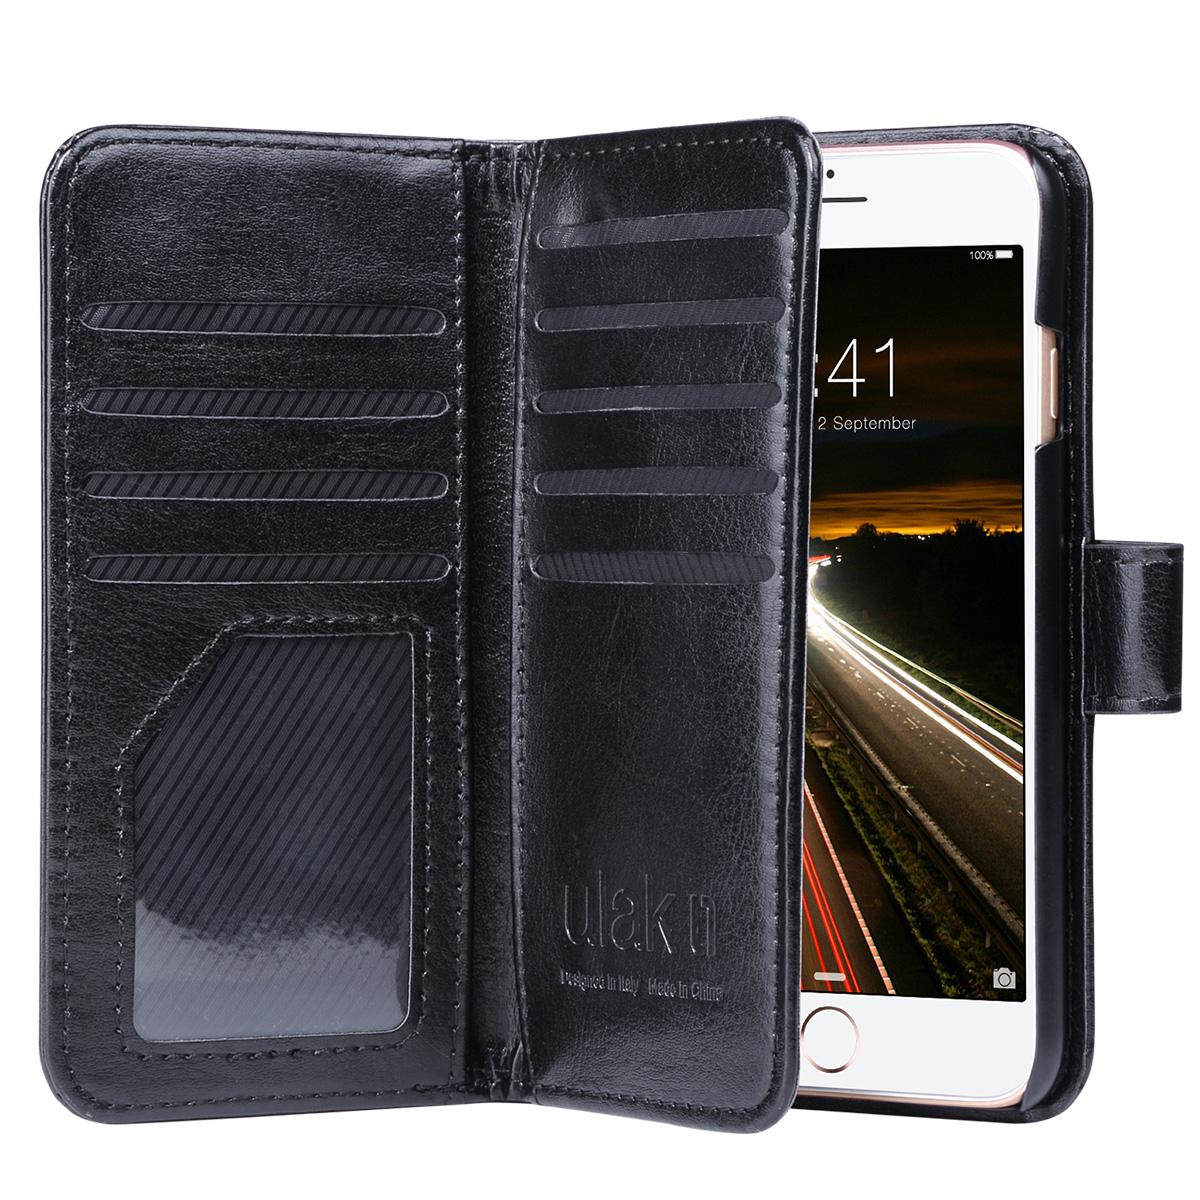 Wallet Phone Holder Iphone